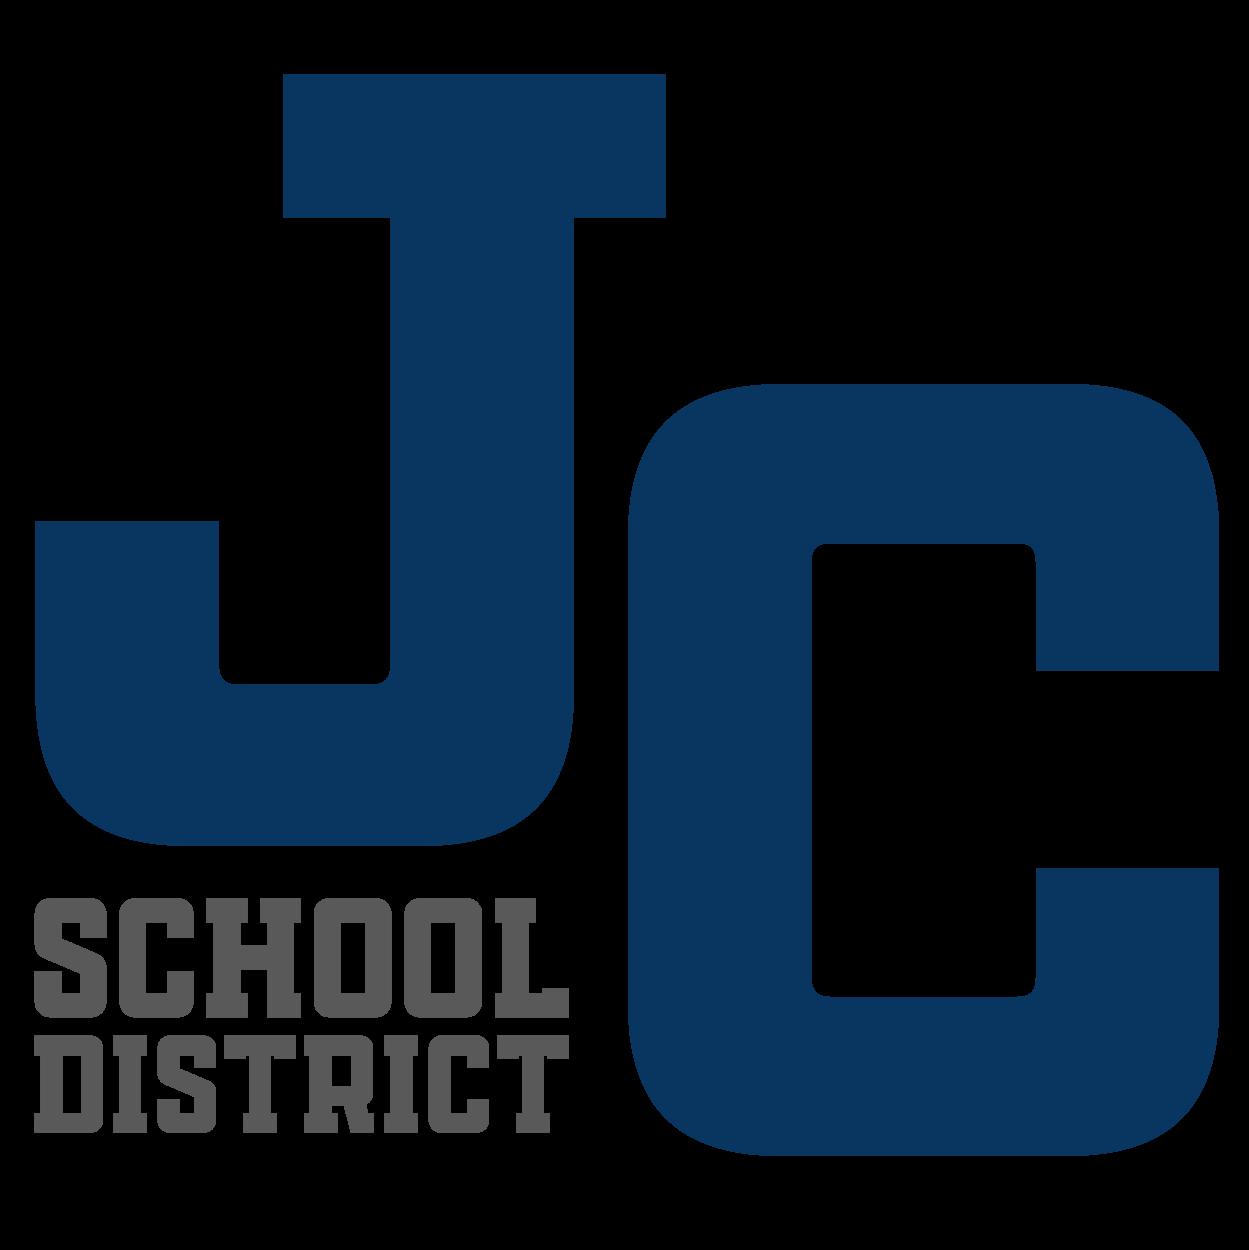 JC School District